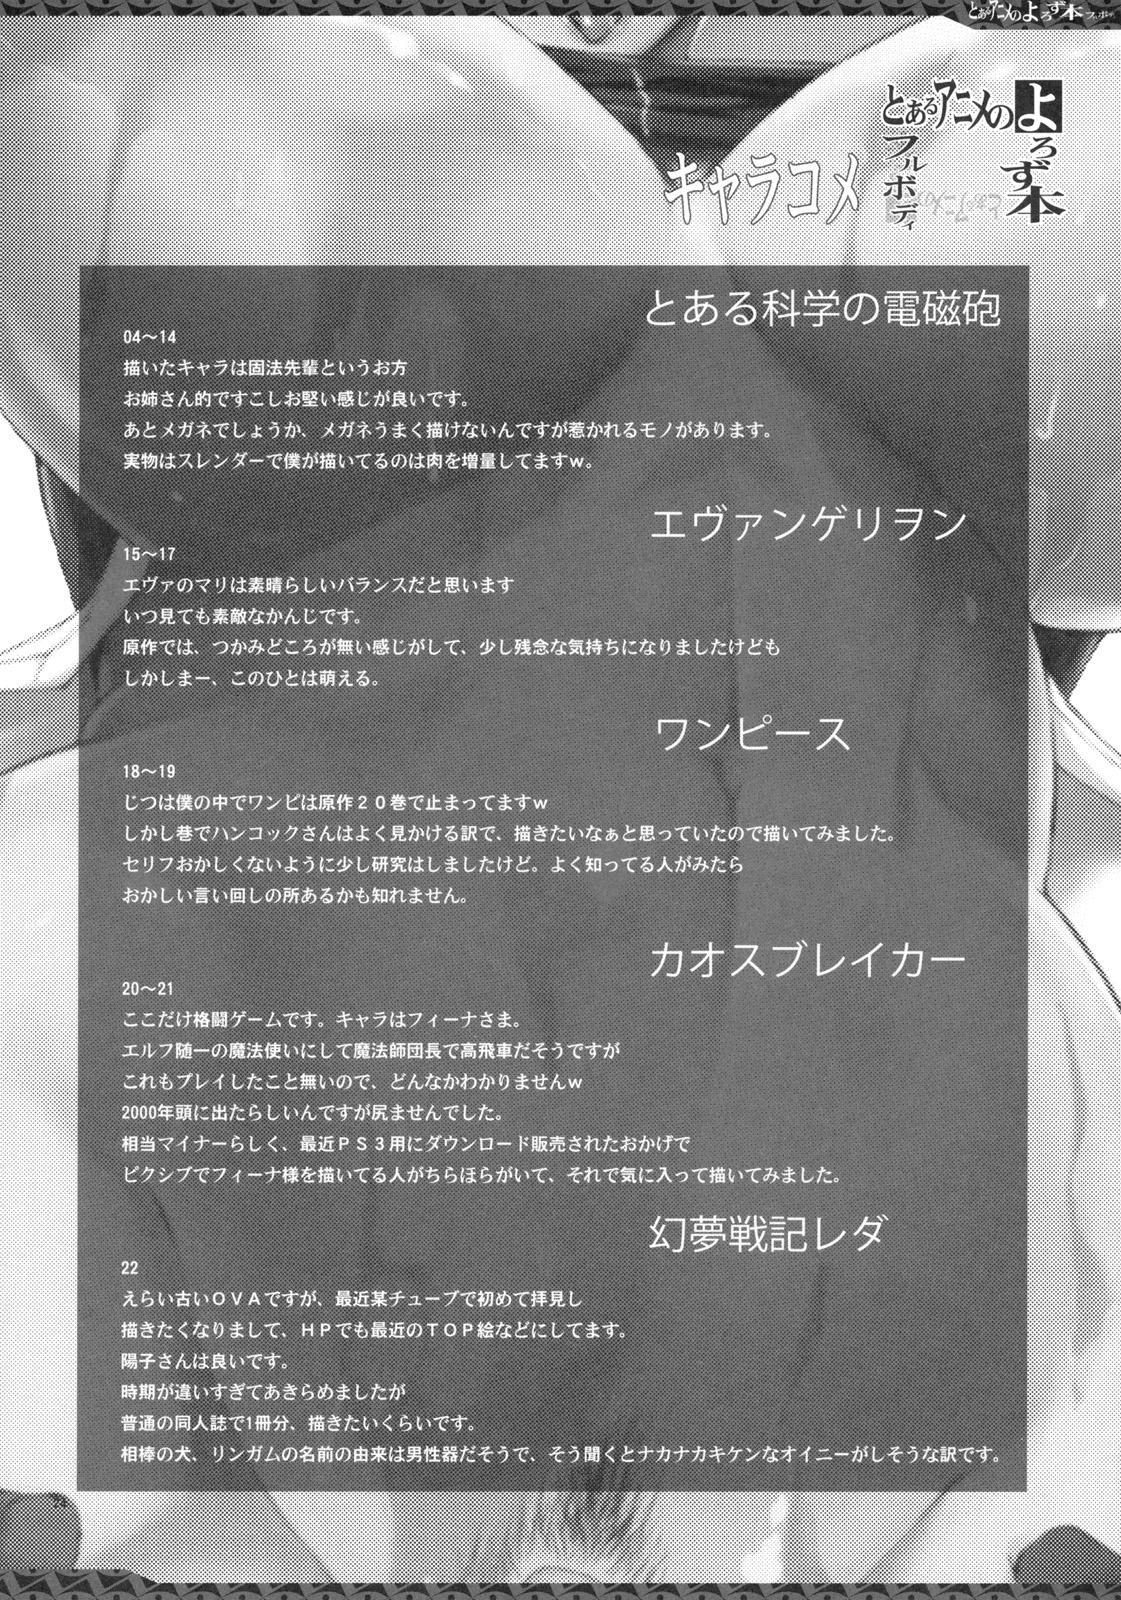 Toaru Anime no Yorozubon Full Body 22